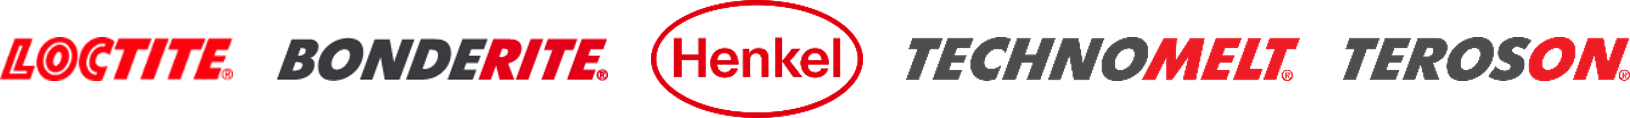 Referenz Henkel_Logos